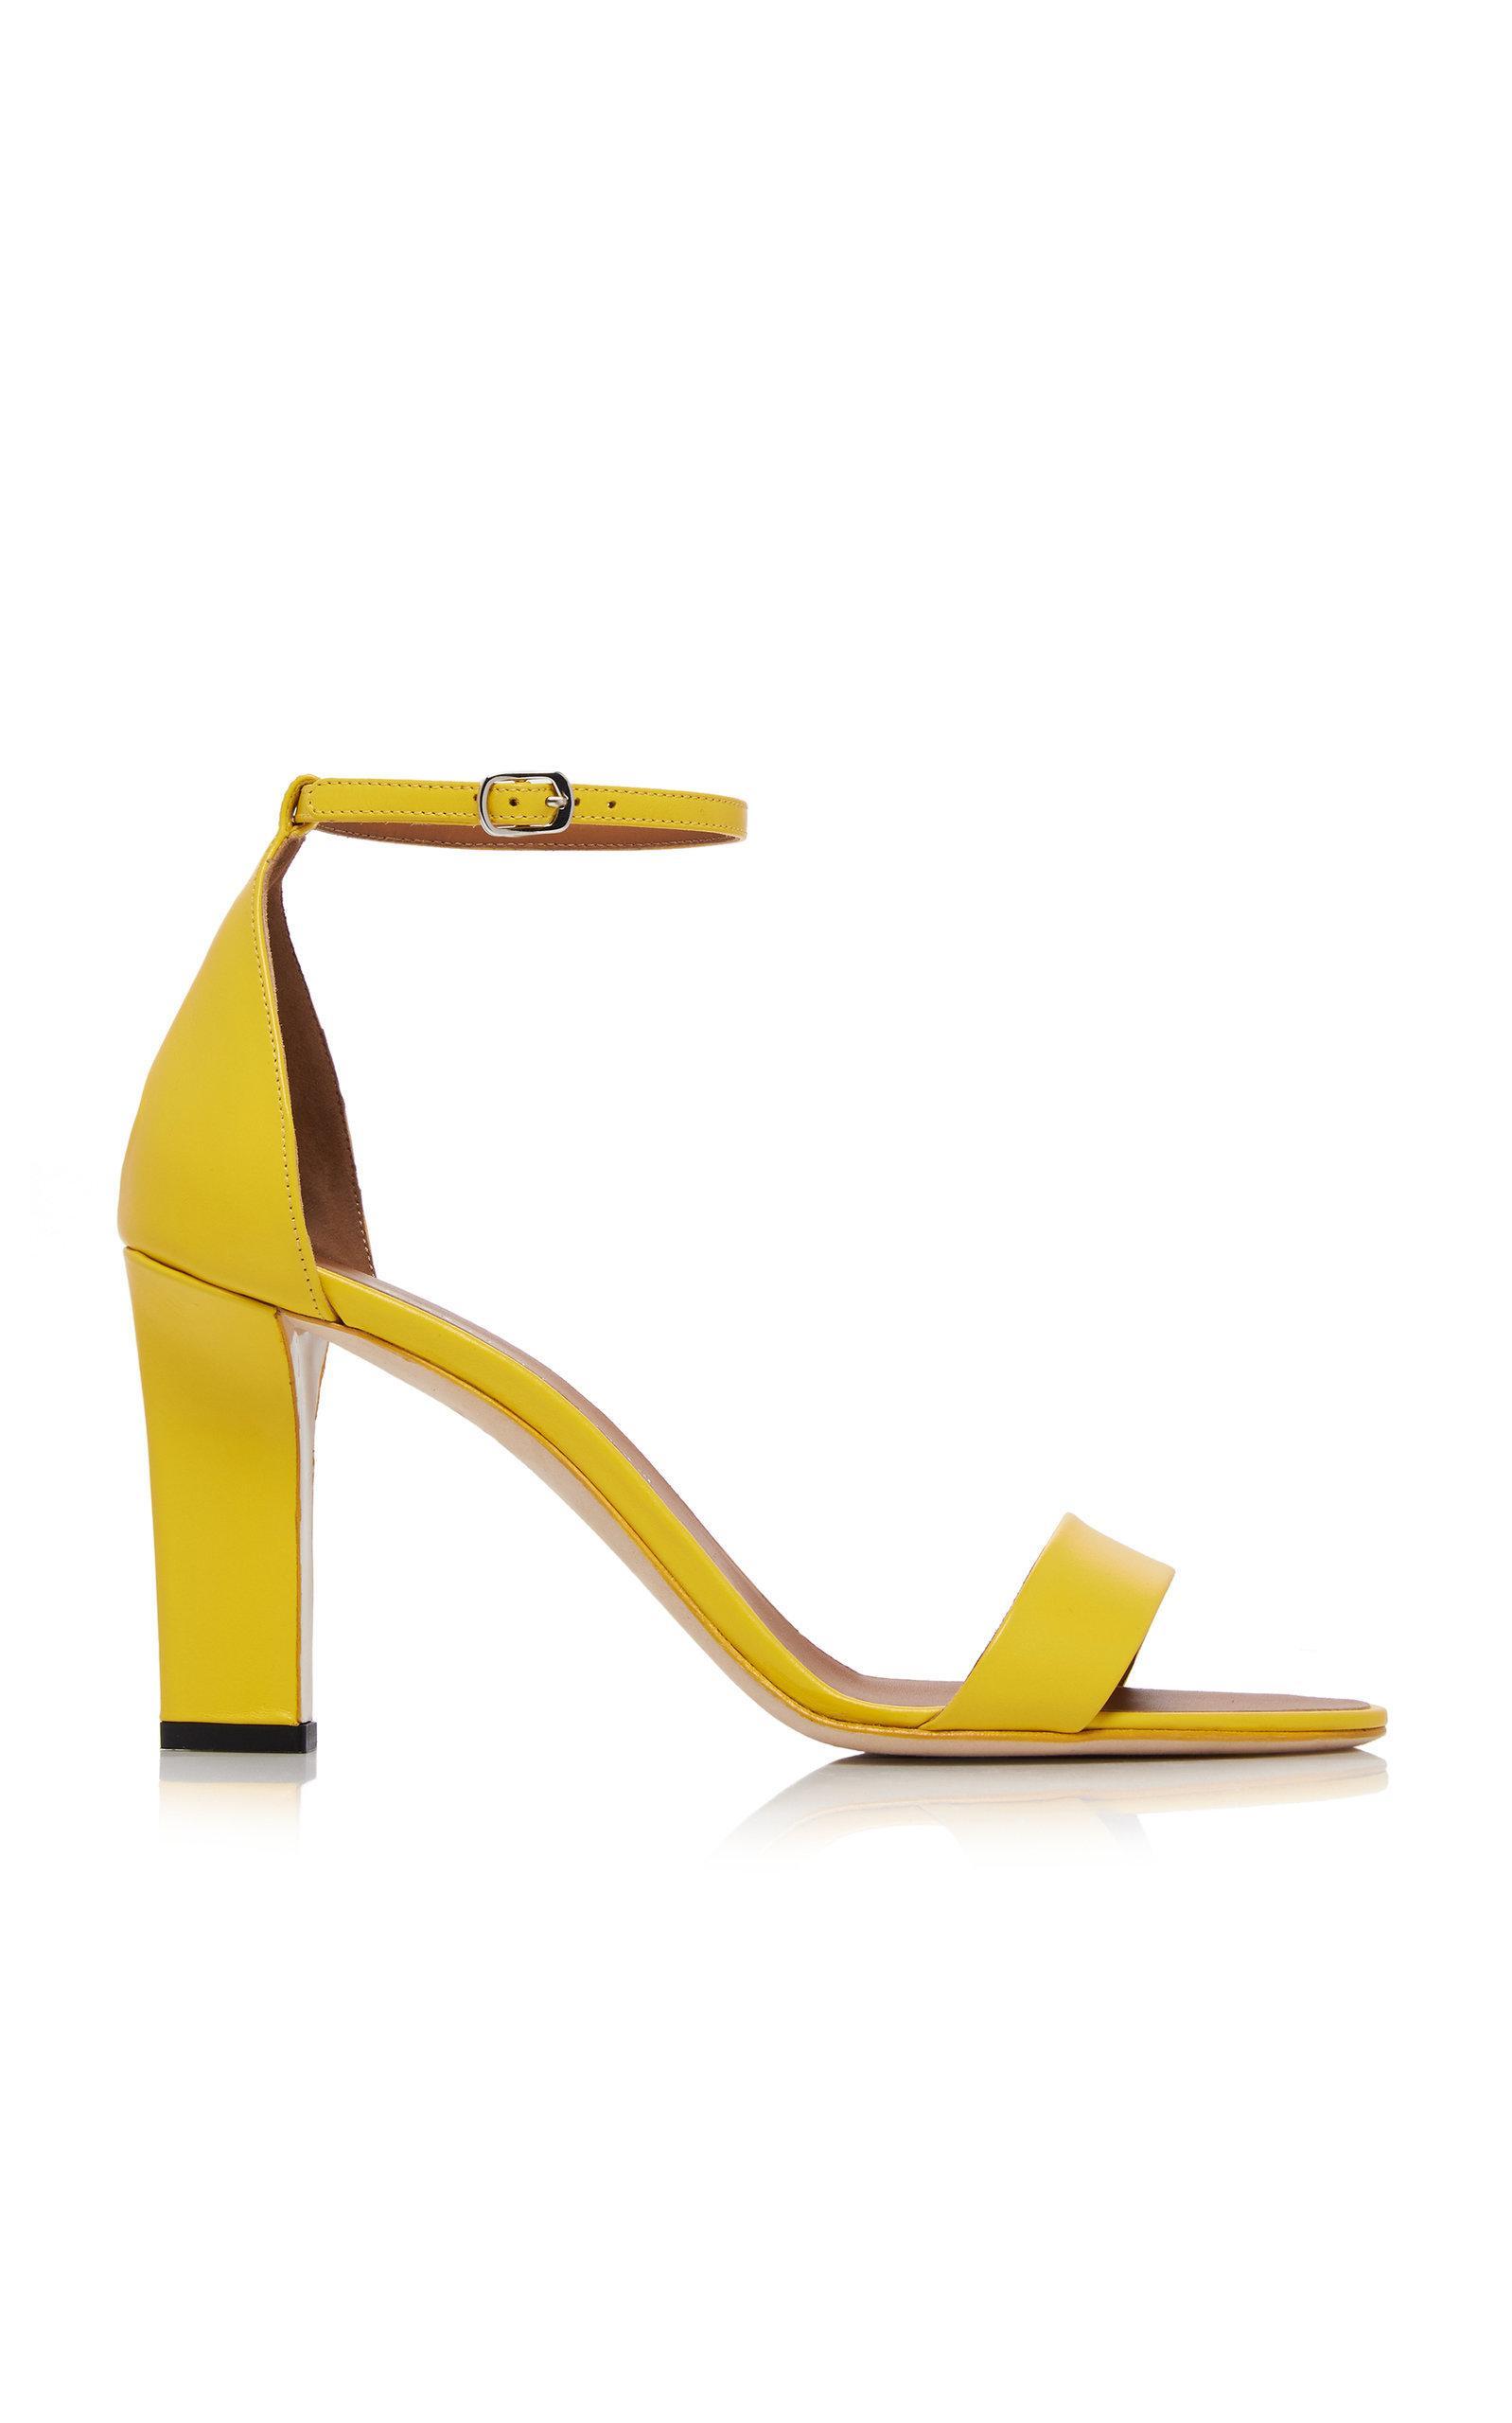 97e4f44848ce Victoria Beckham Chunky Heel Anna Sandal In Yellow